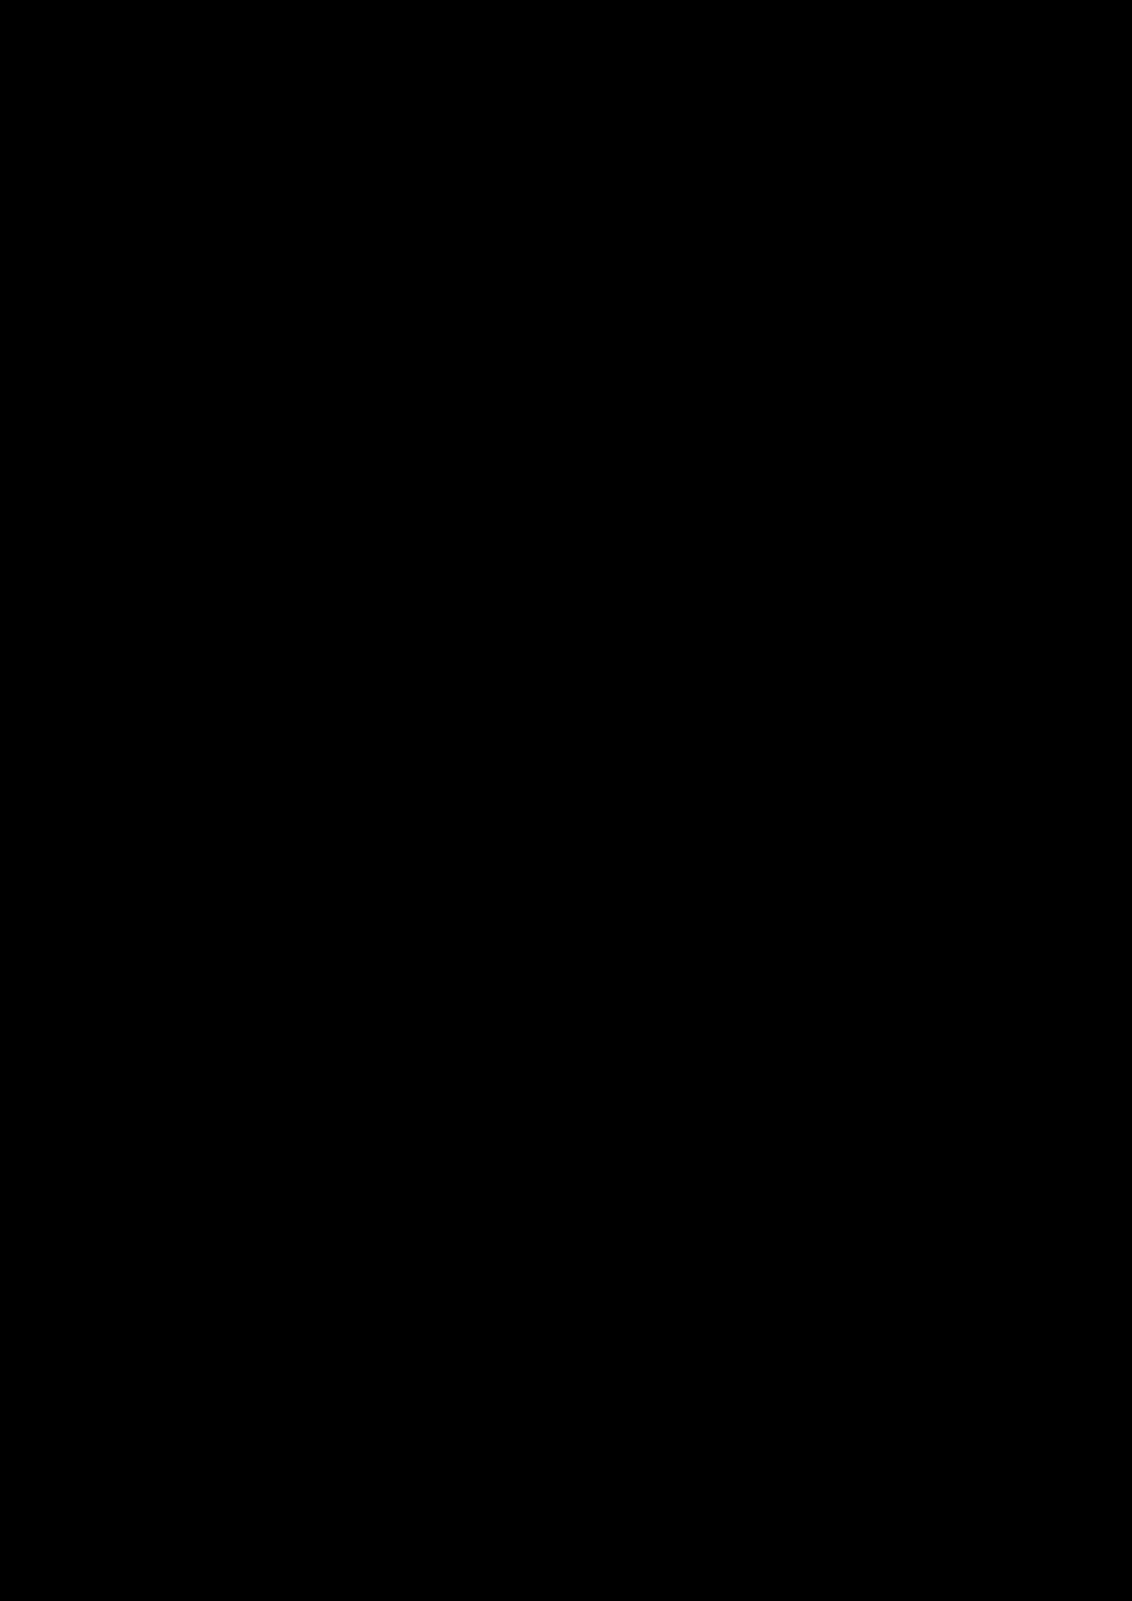 Prosti slide, Image 30